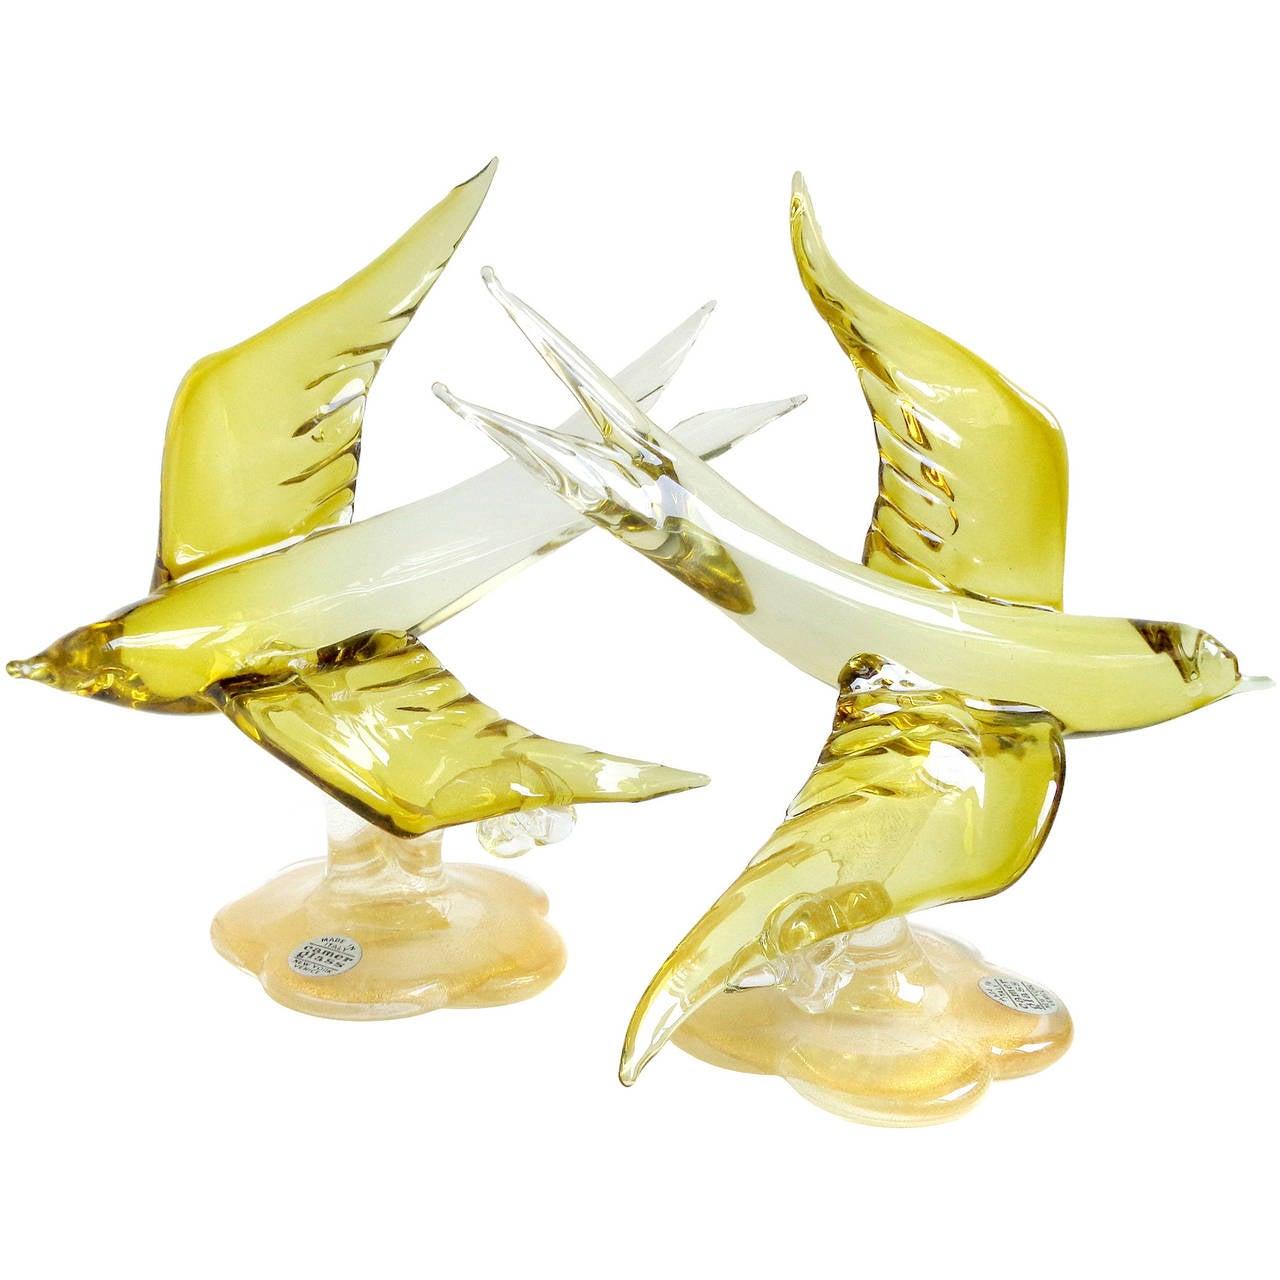 Bird Sculptures Murano Olive Yellow Gold Flecks Italian Art Glass Flying Swallow